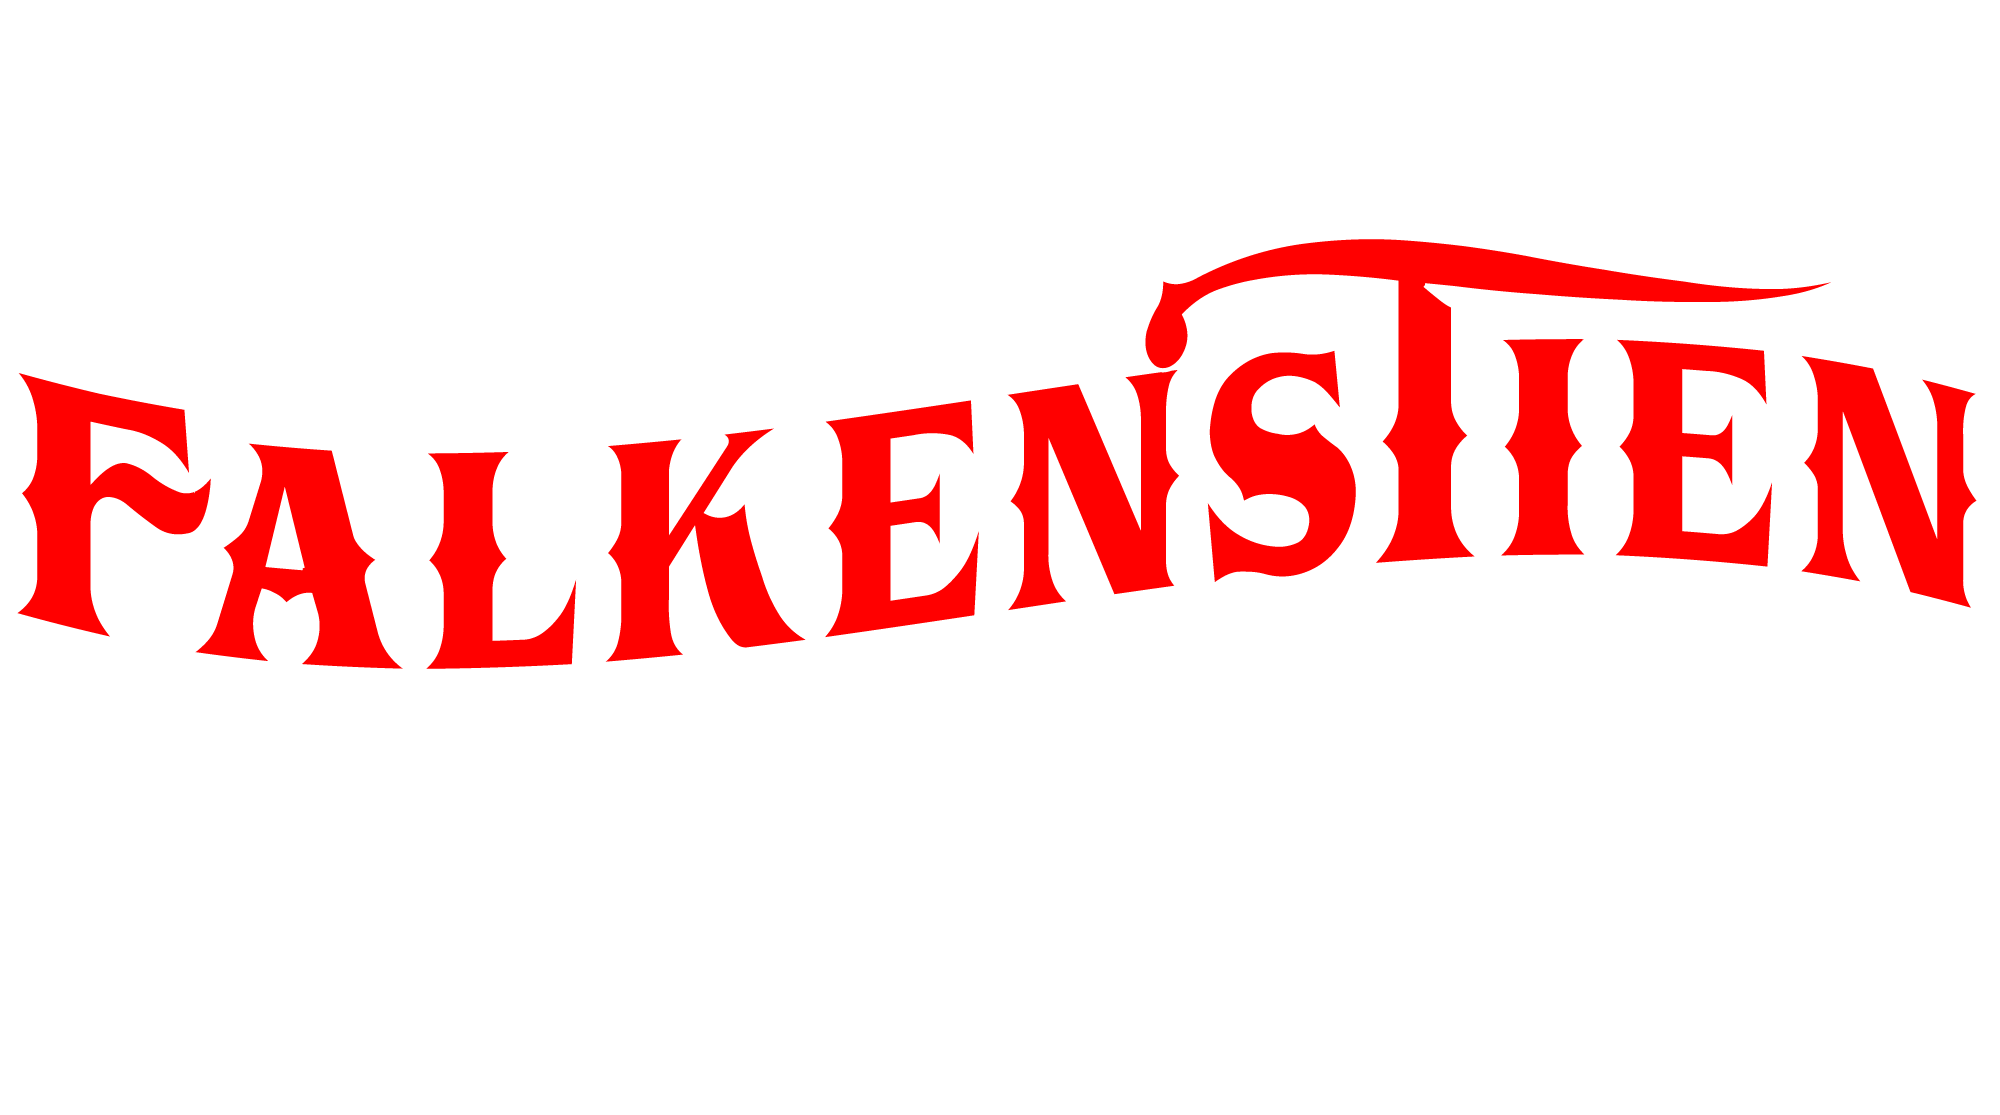 Falkenstein-logo.png